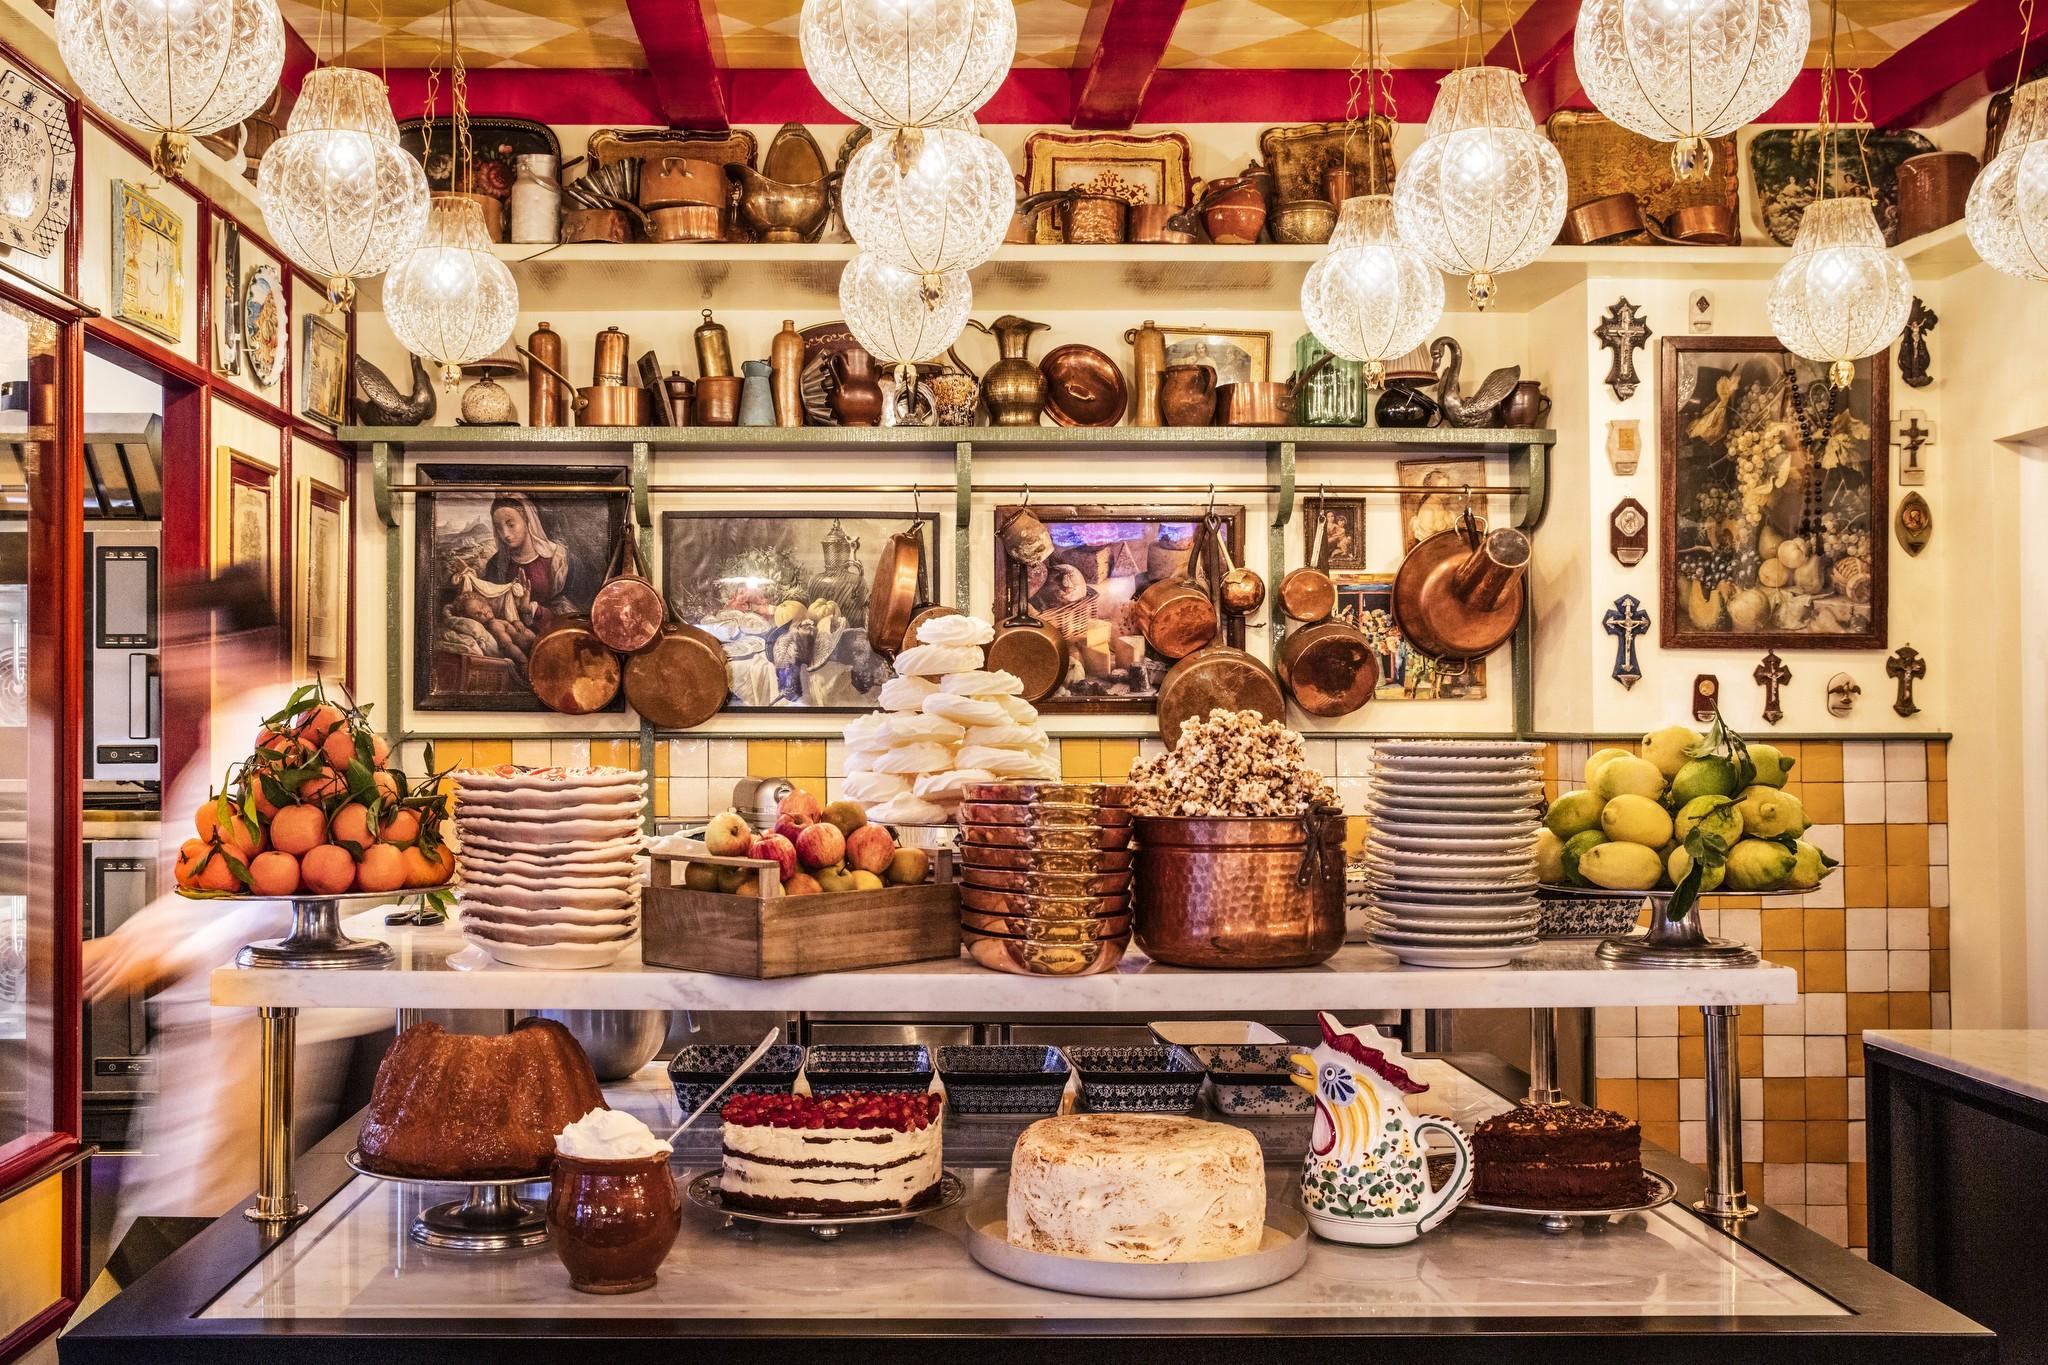 The pastry shop at the entrance of Libertino.